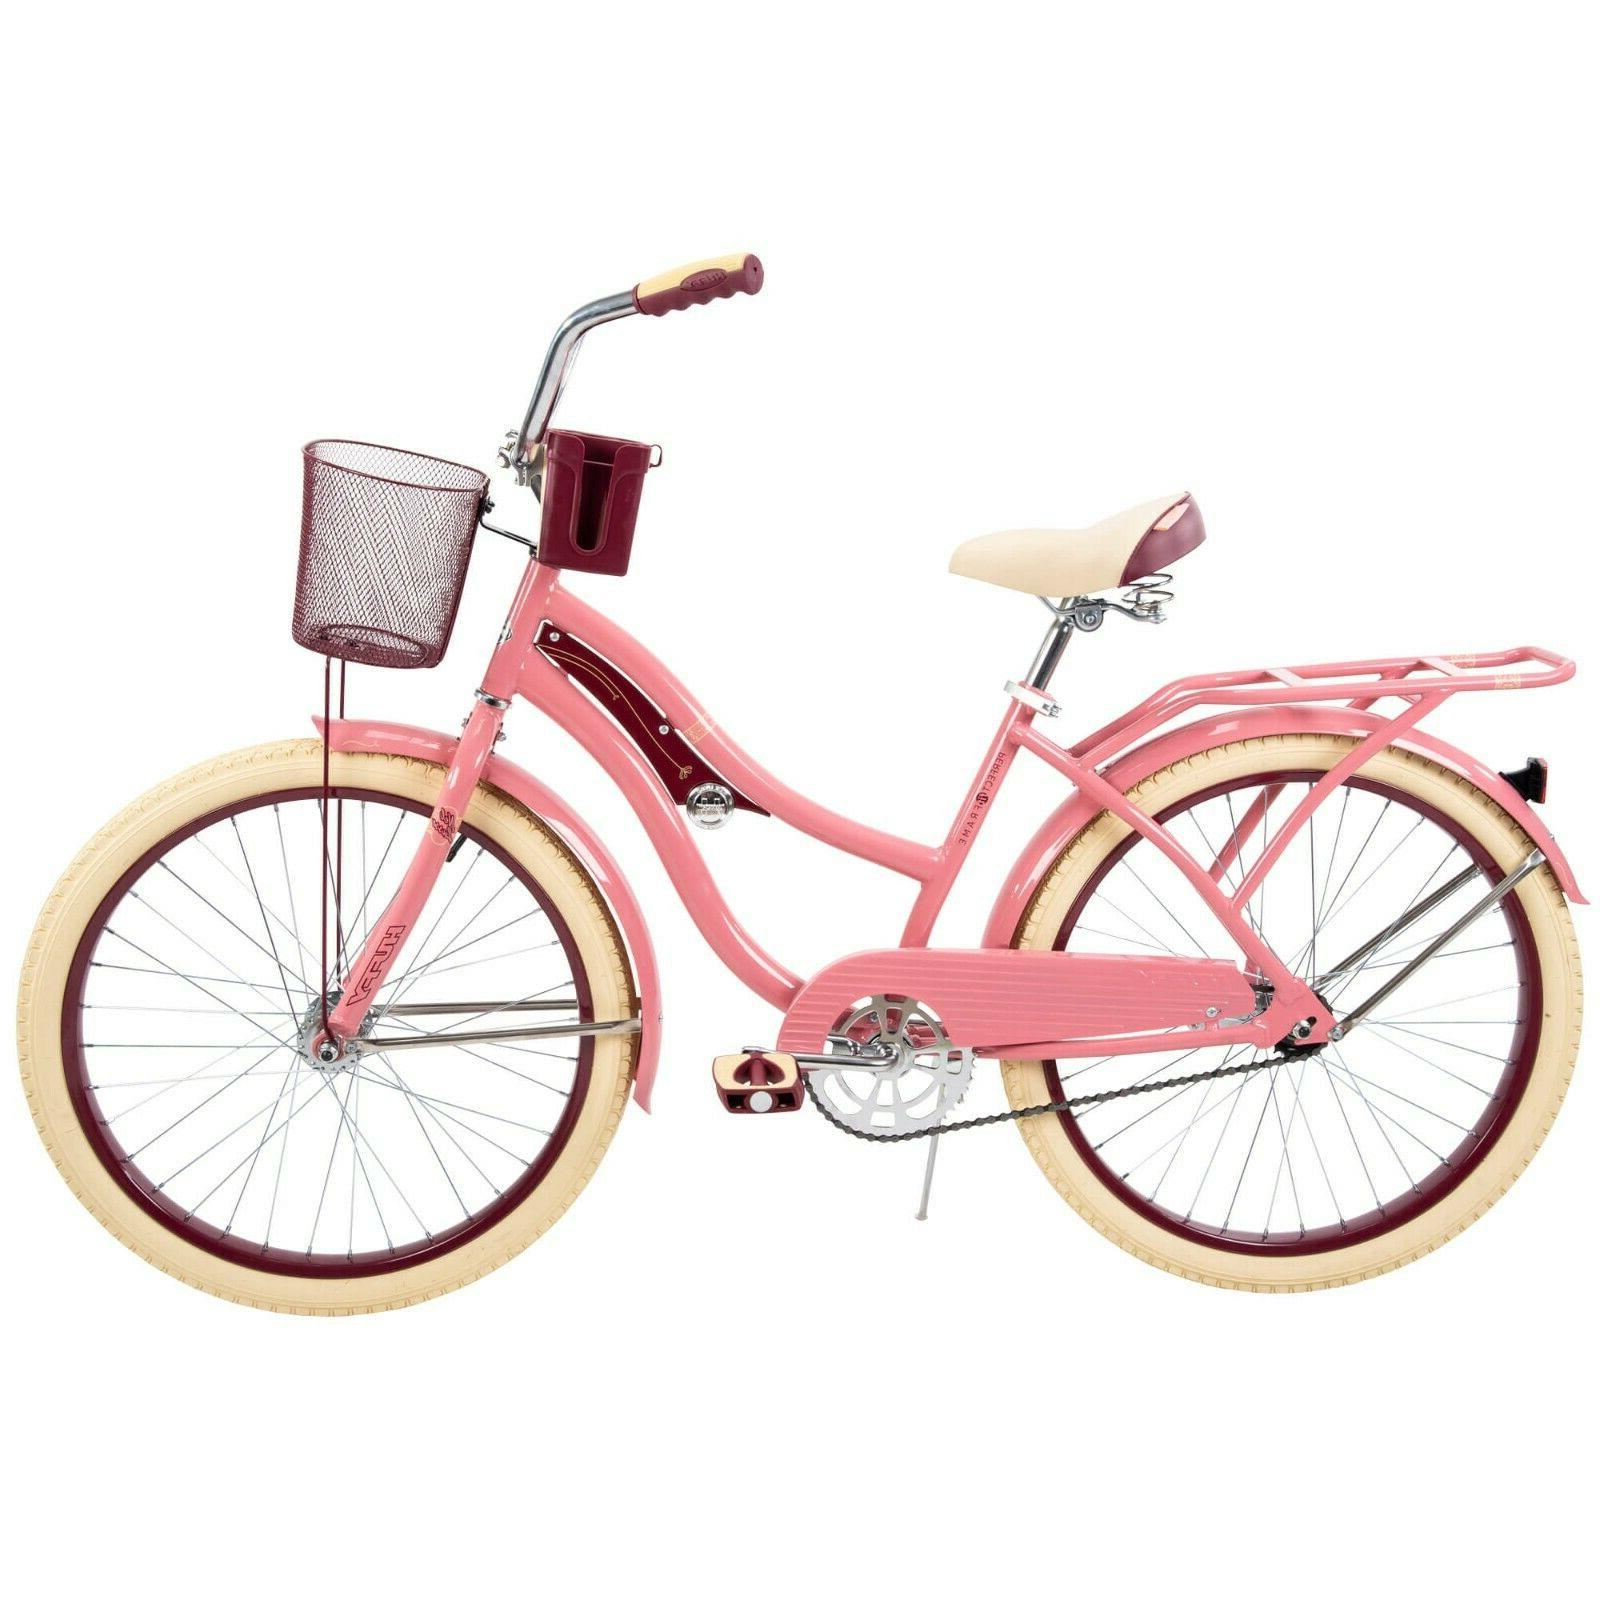 Huffy 54578 Nel Lusso 24 inch Cruiser Bike -Pink Blush Powde